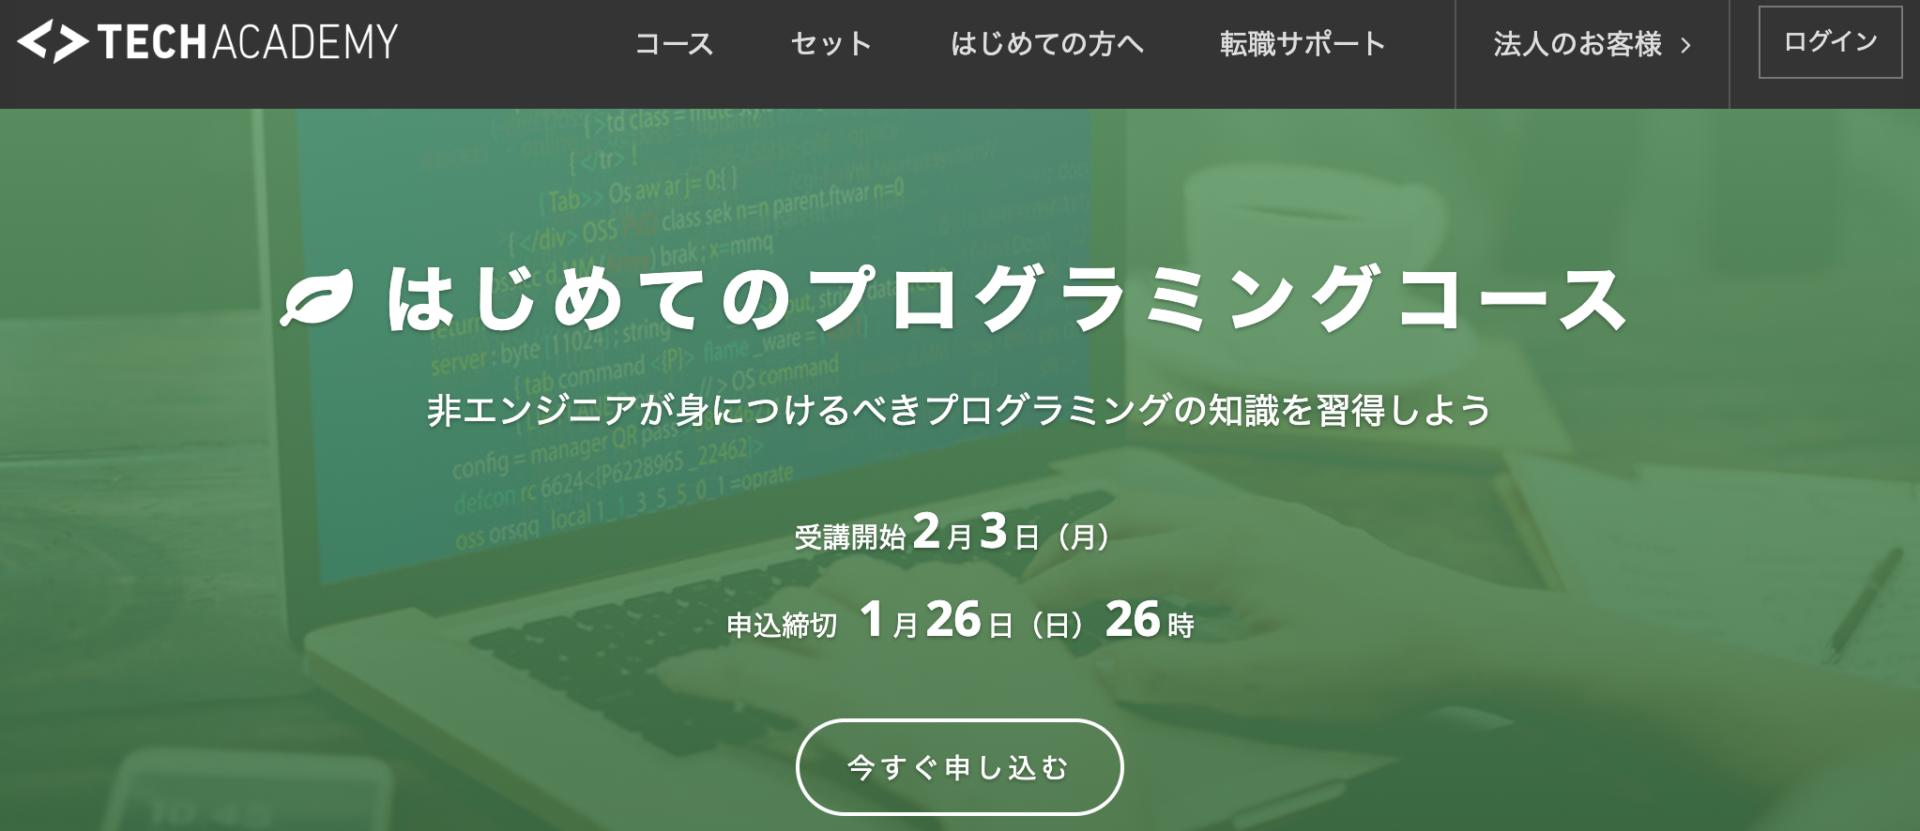 TechAcademy(テックアカデミー)